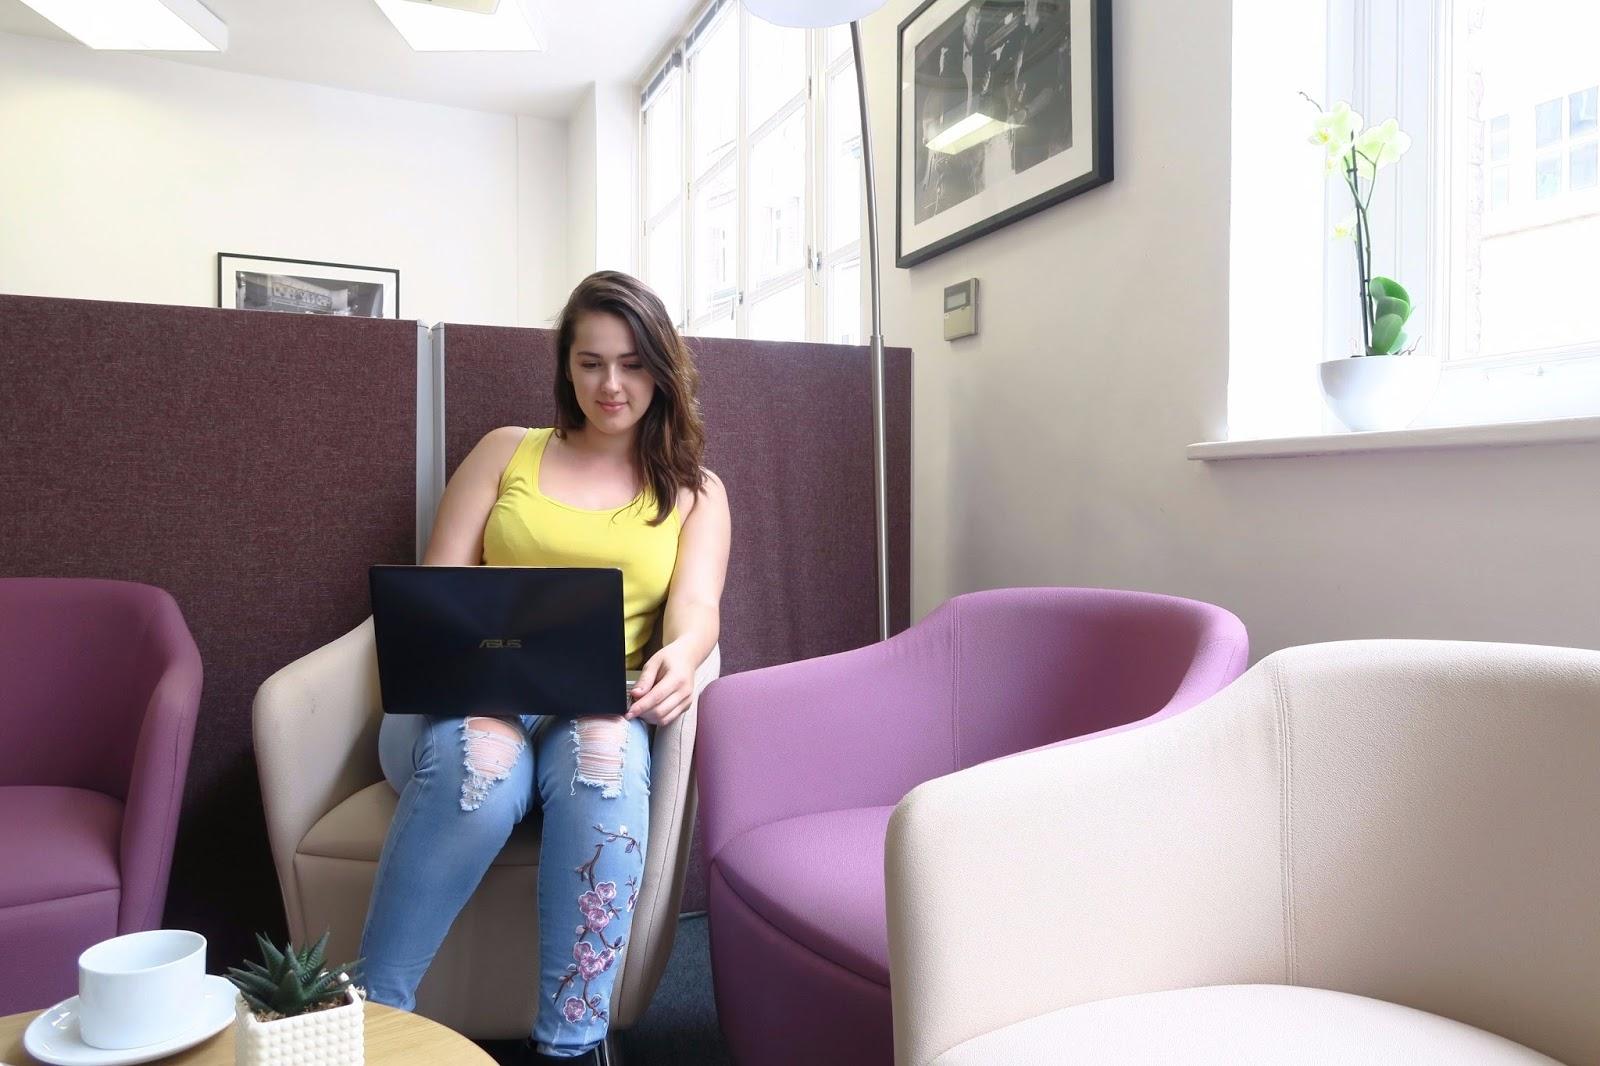 Natalie browsing on ASUS Zenbook 3